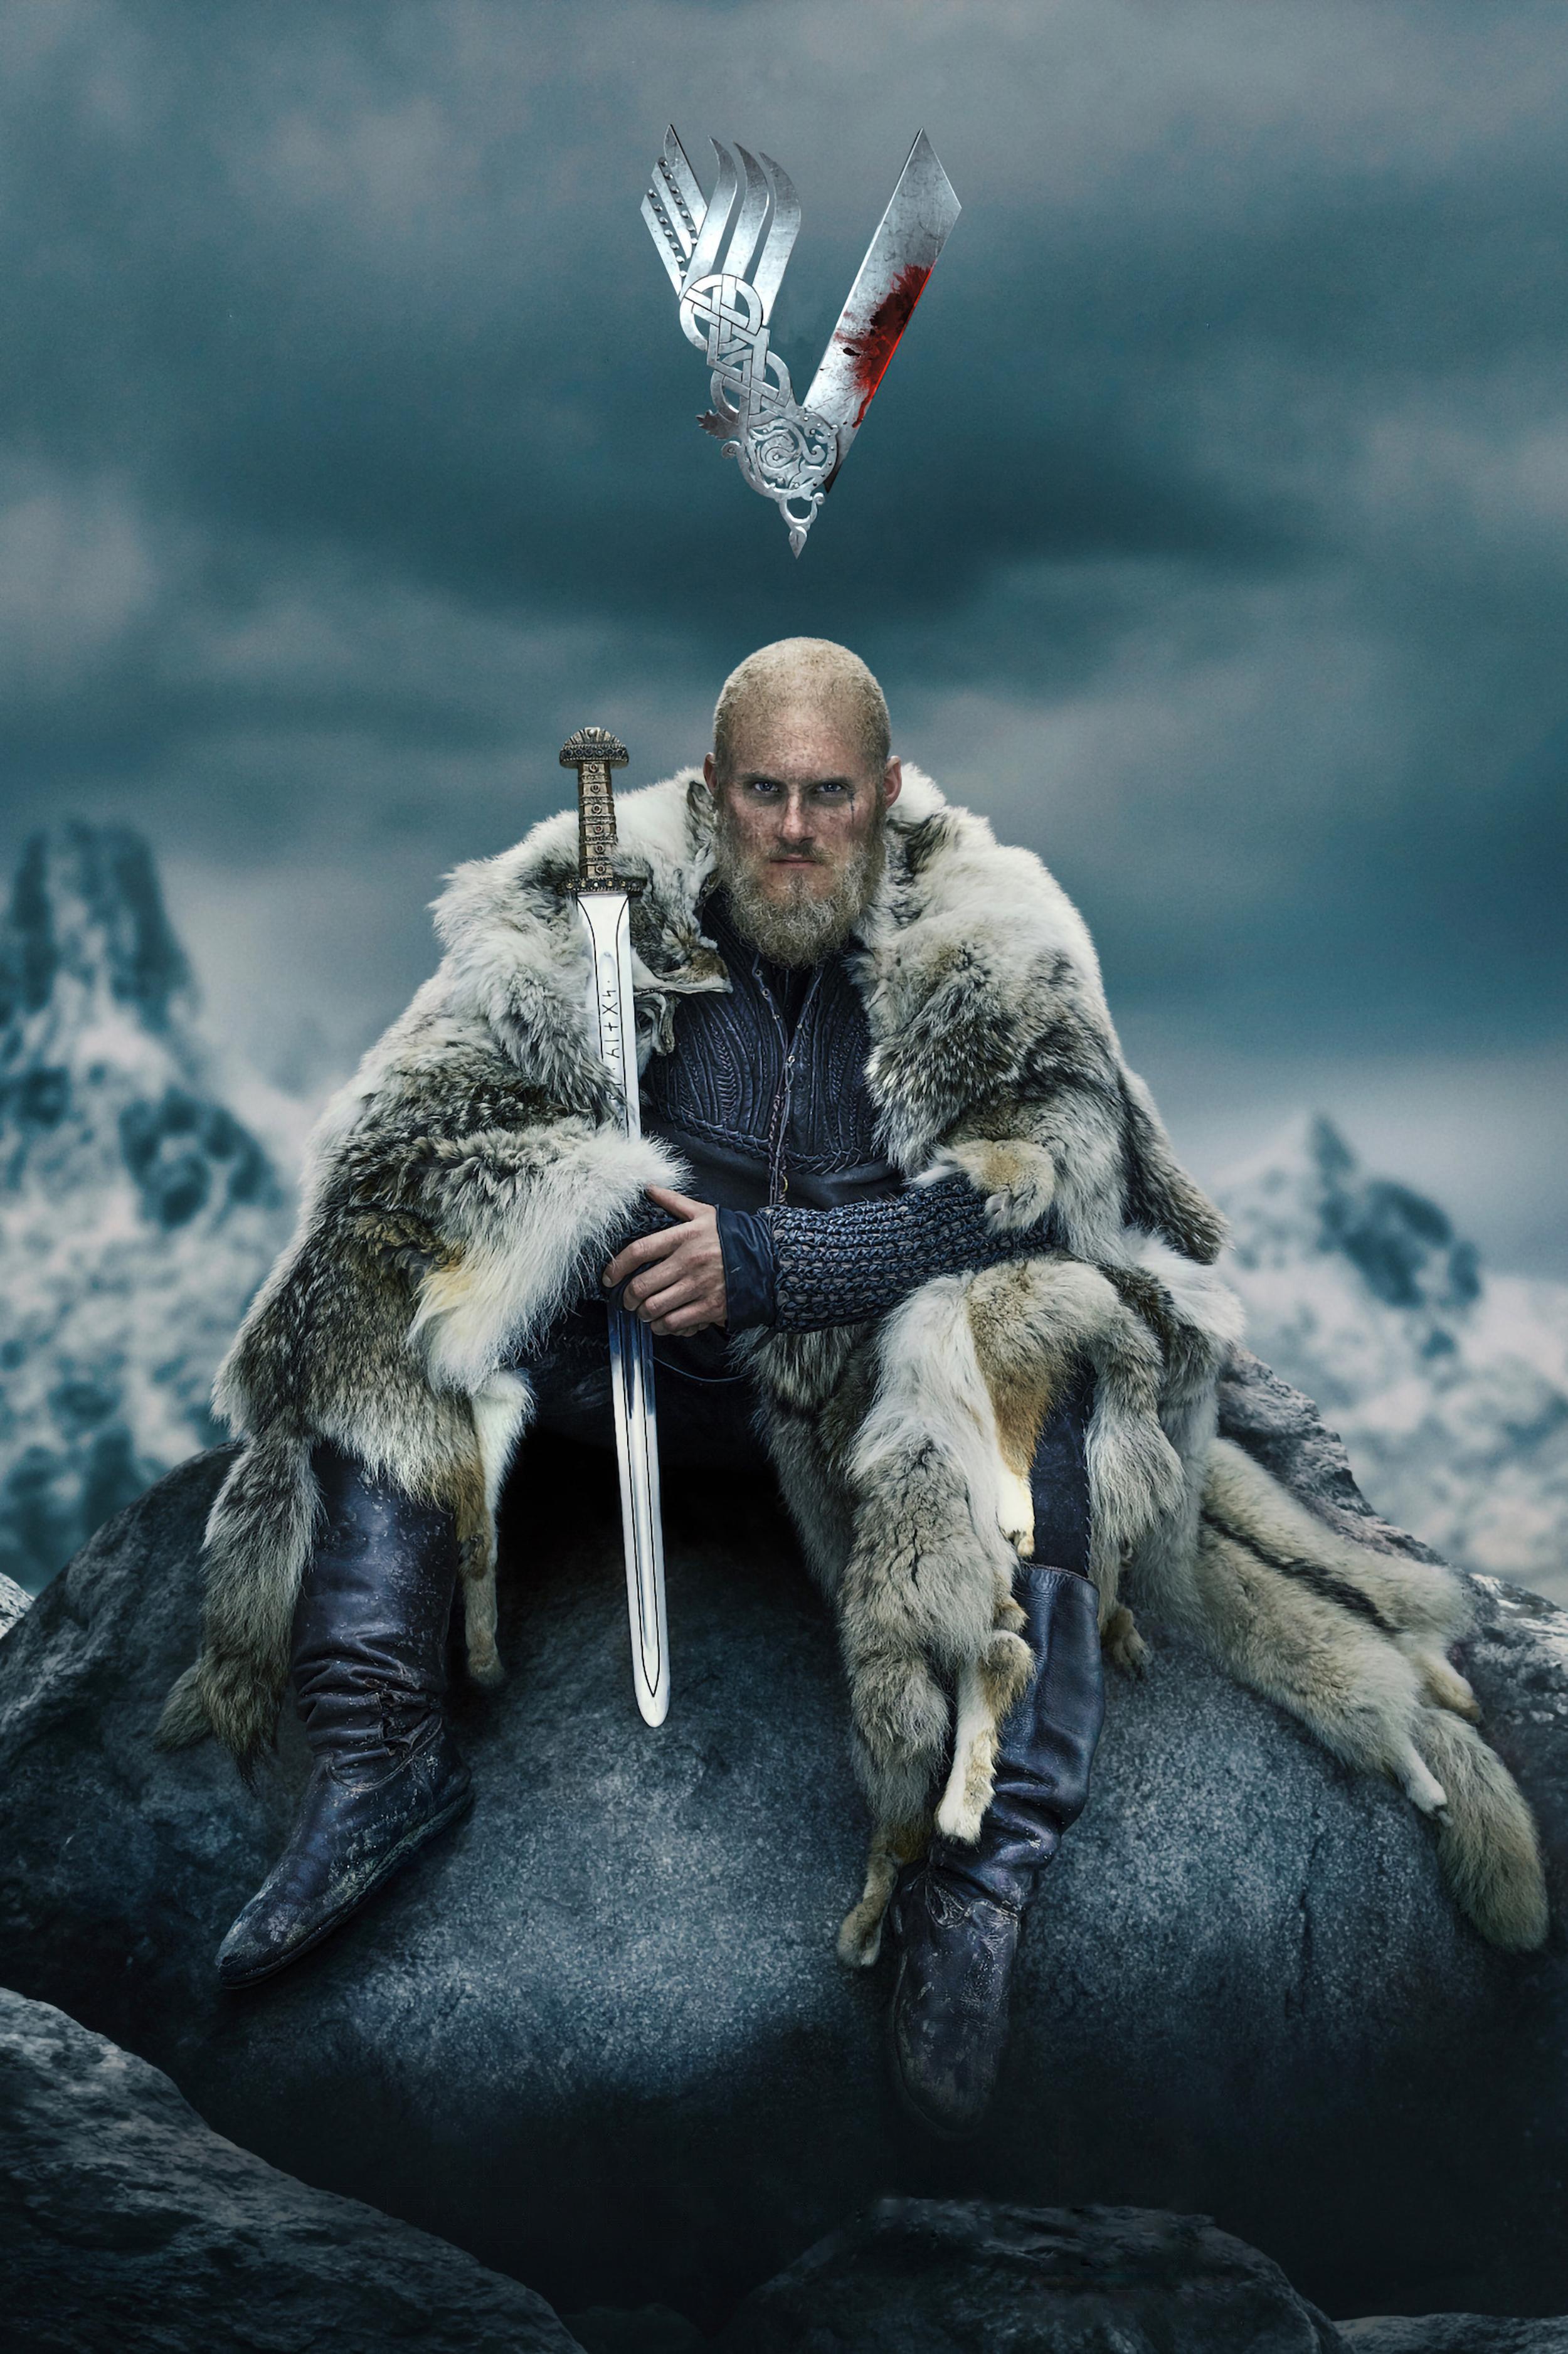 Vikings Season 6 Wallpaper, HD TV Series 4K Wallpapers ...